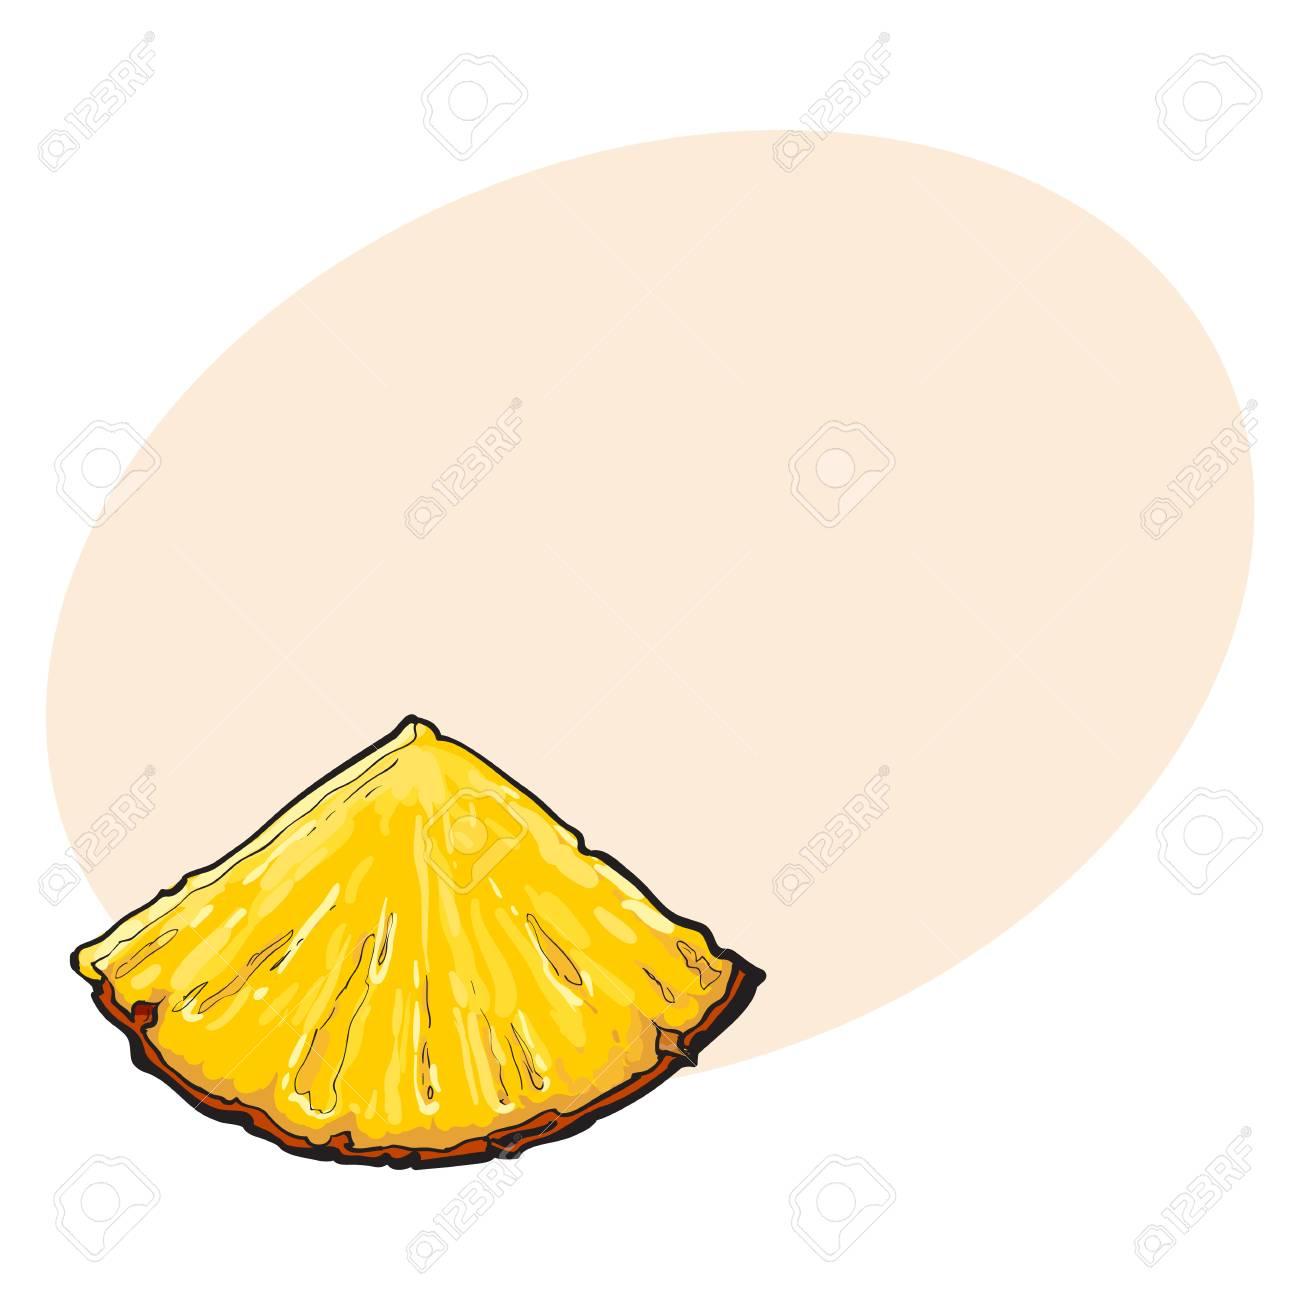 Unpeeled Pineapplewedge Trojuhelnikovy Rez Sifde Pohled Skicovy